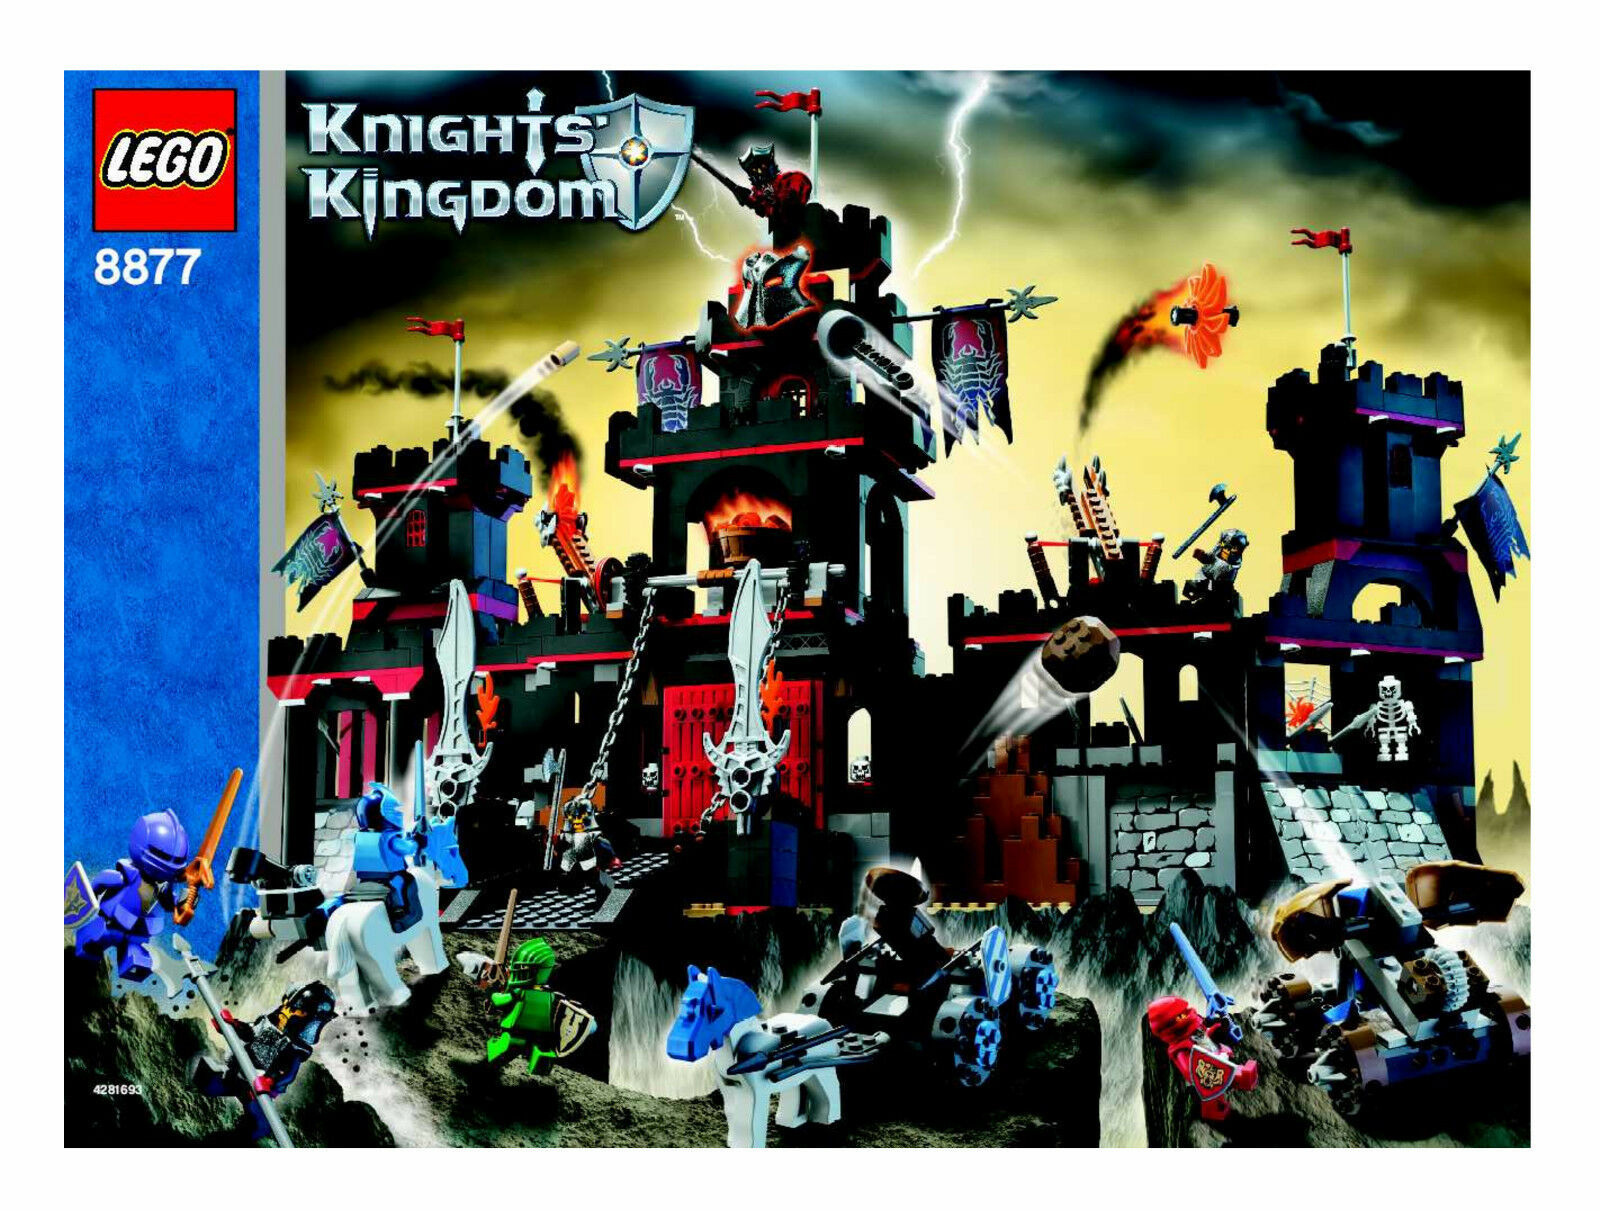 Lego Knights Kingdom 8877 8877 8877 Vladek's Fortress New Sealed 280604